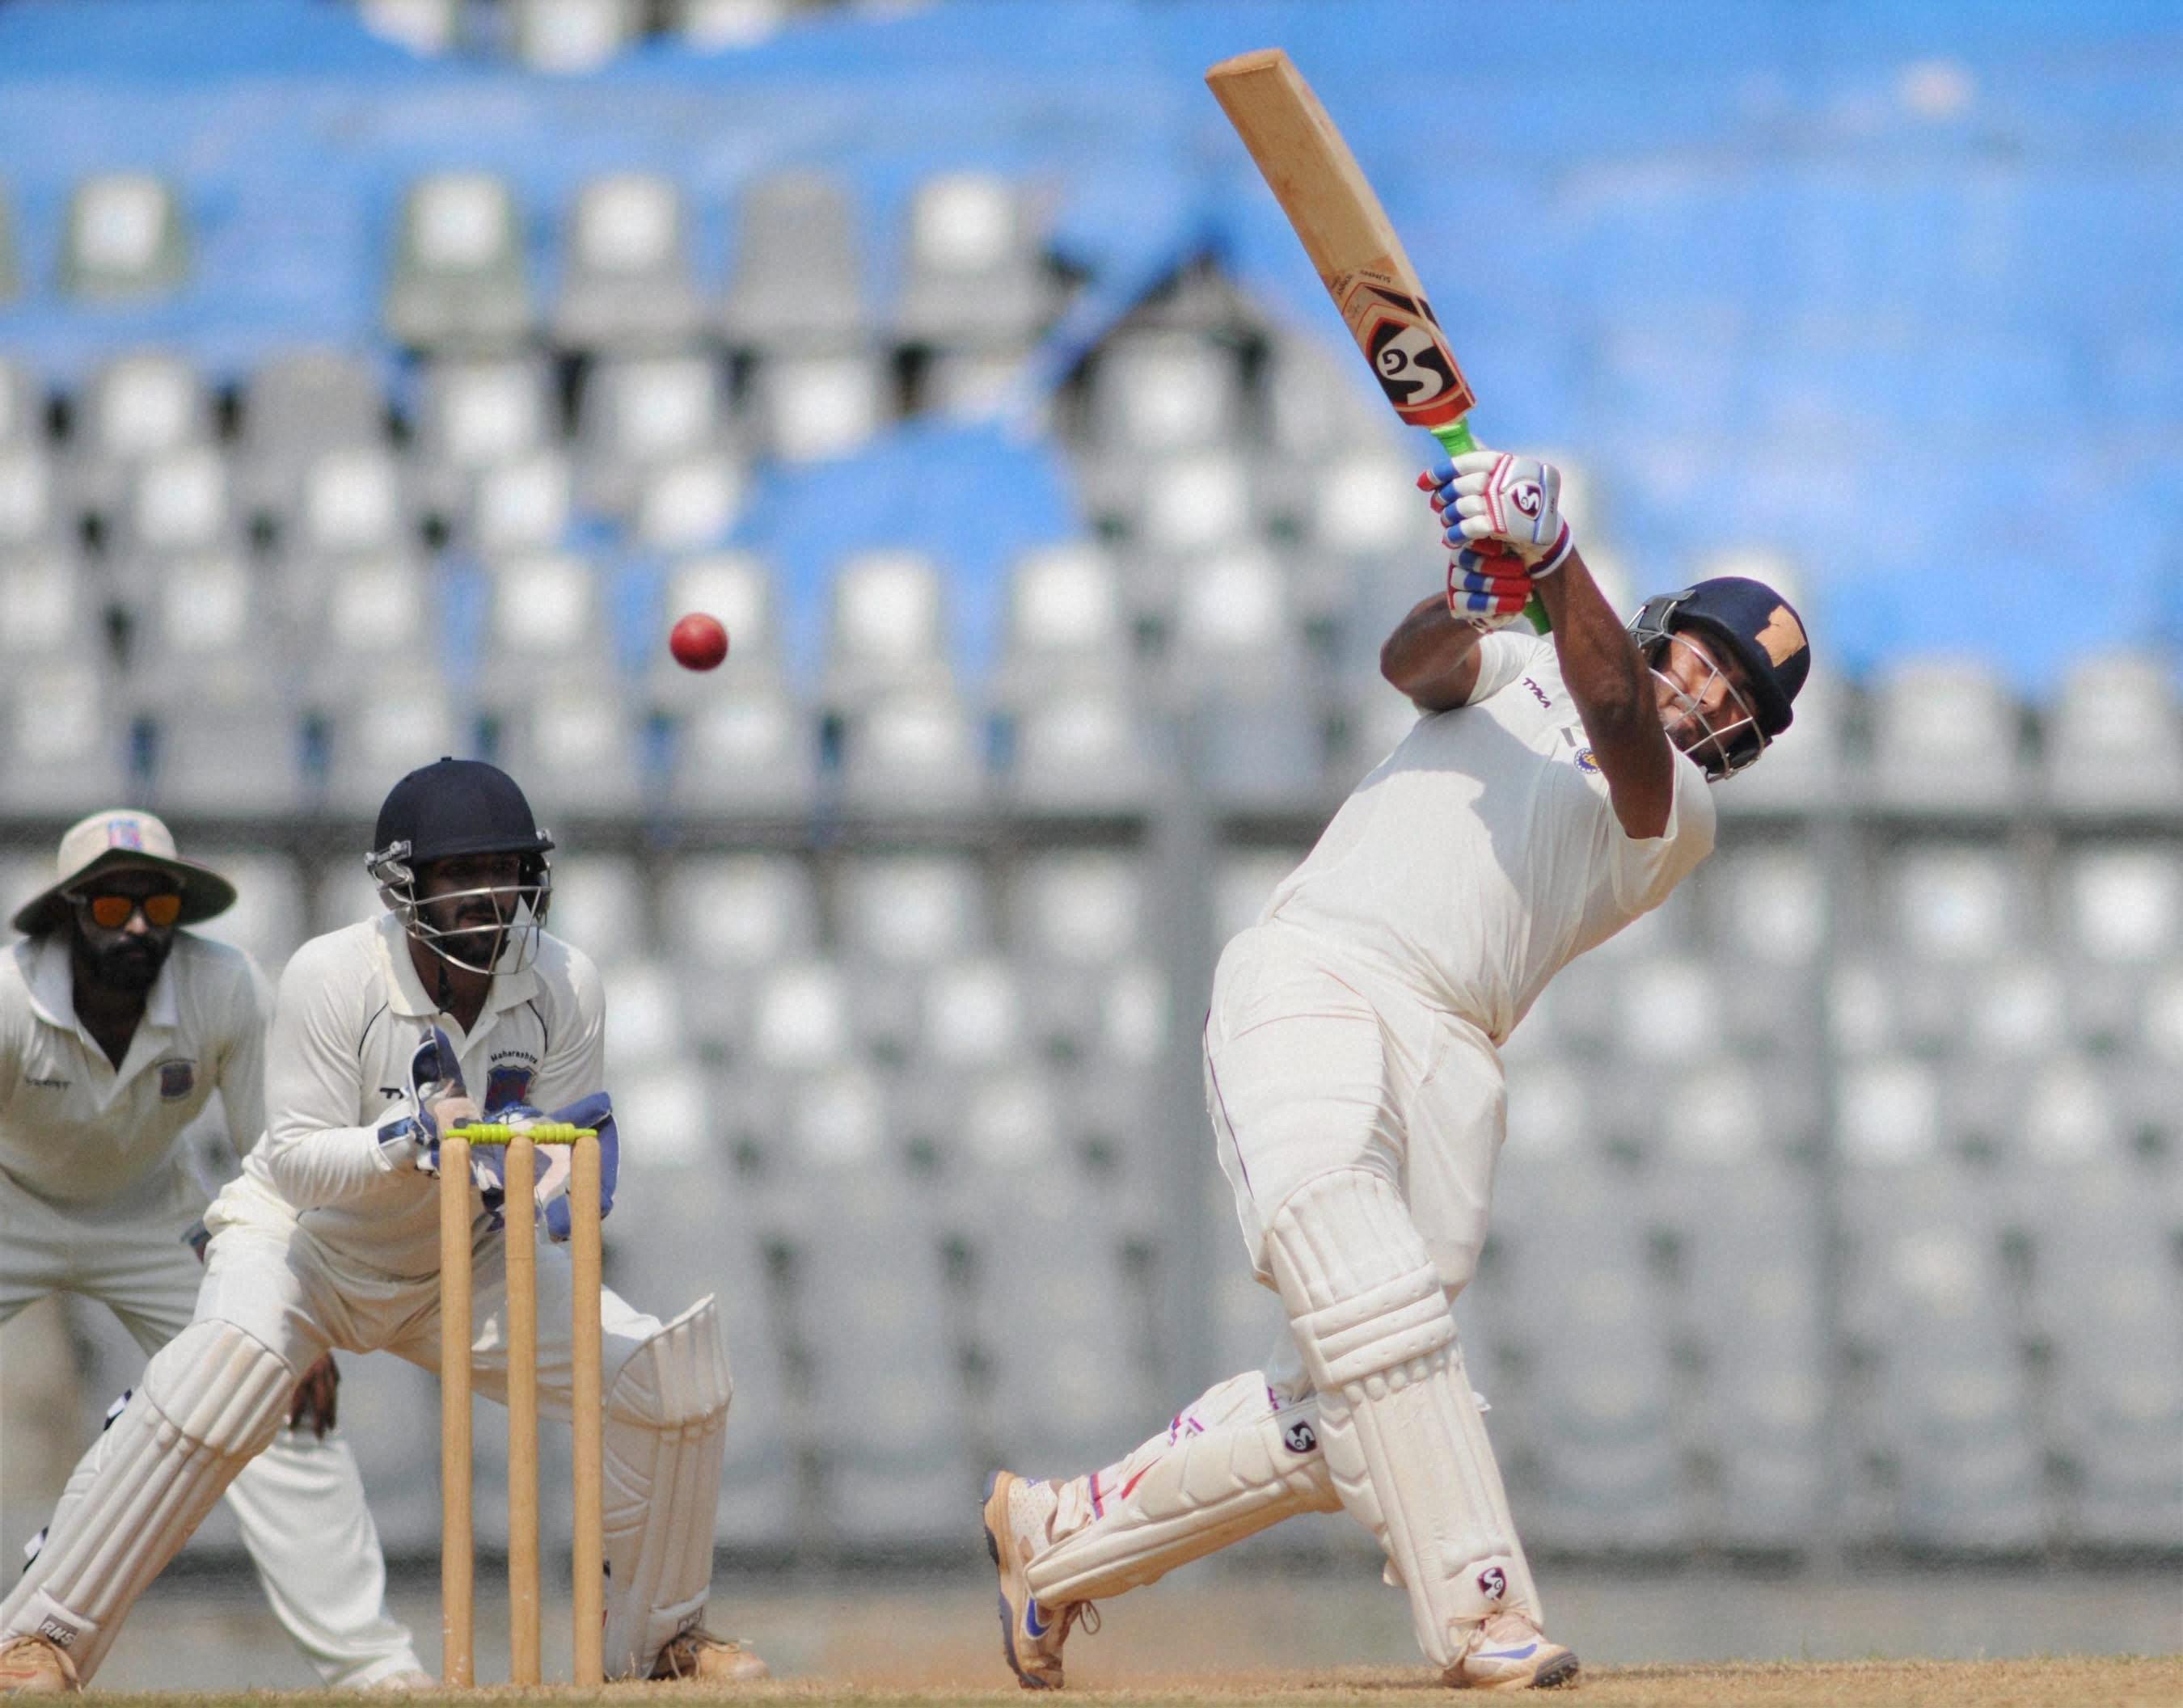 Rishabh Pant set the Ranji Trophy ablaze this season, hitting 972 runs, including a triple century (Image credit: PTI)